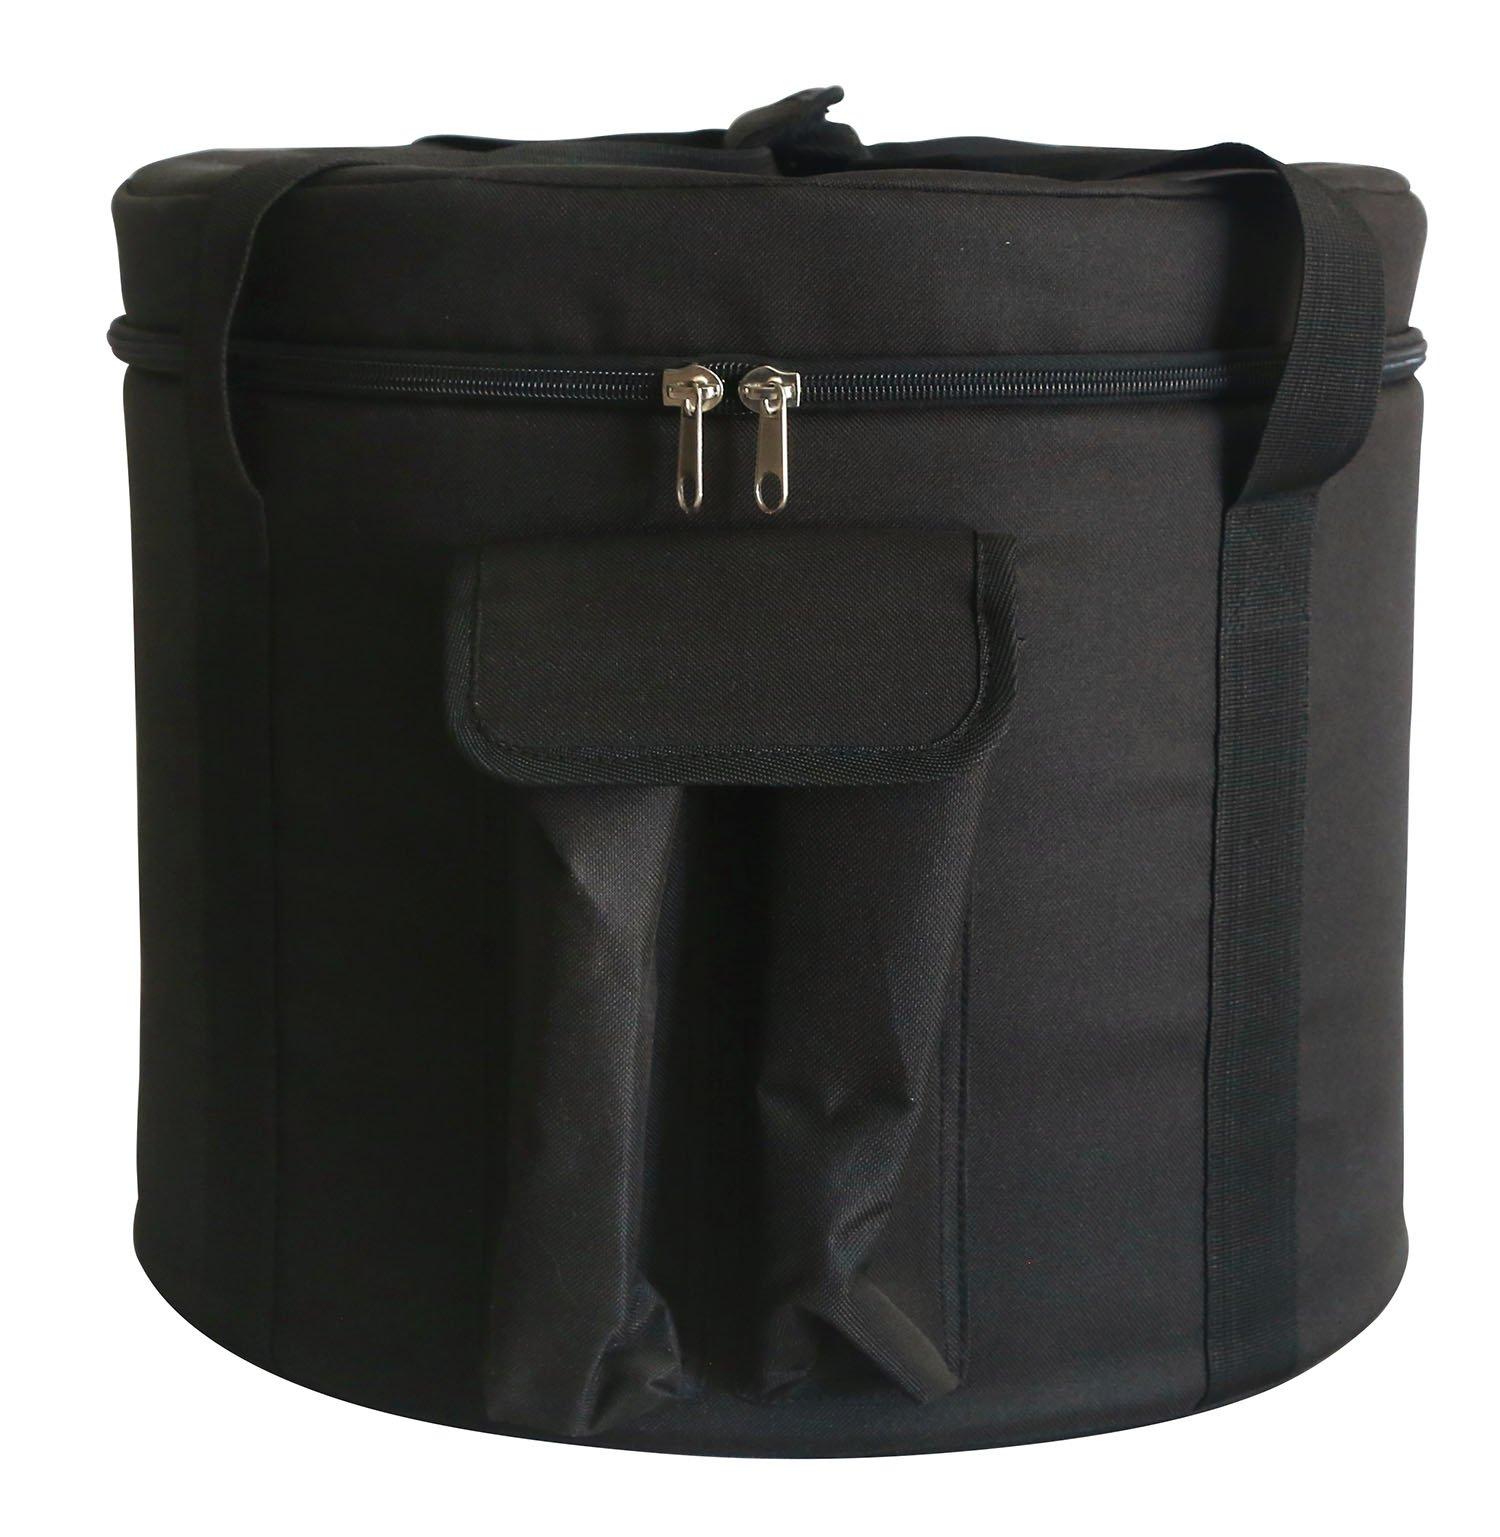 Crystal Singing Bowl Carry Case Bag Padded Pack For Crystal Singing Bowl Putting 8 Inch Singing Bowls